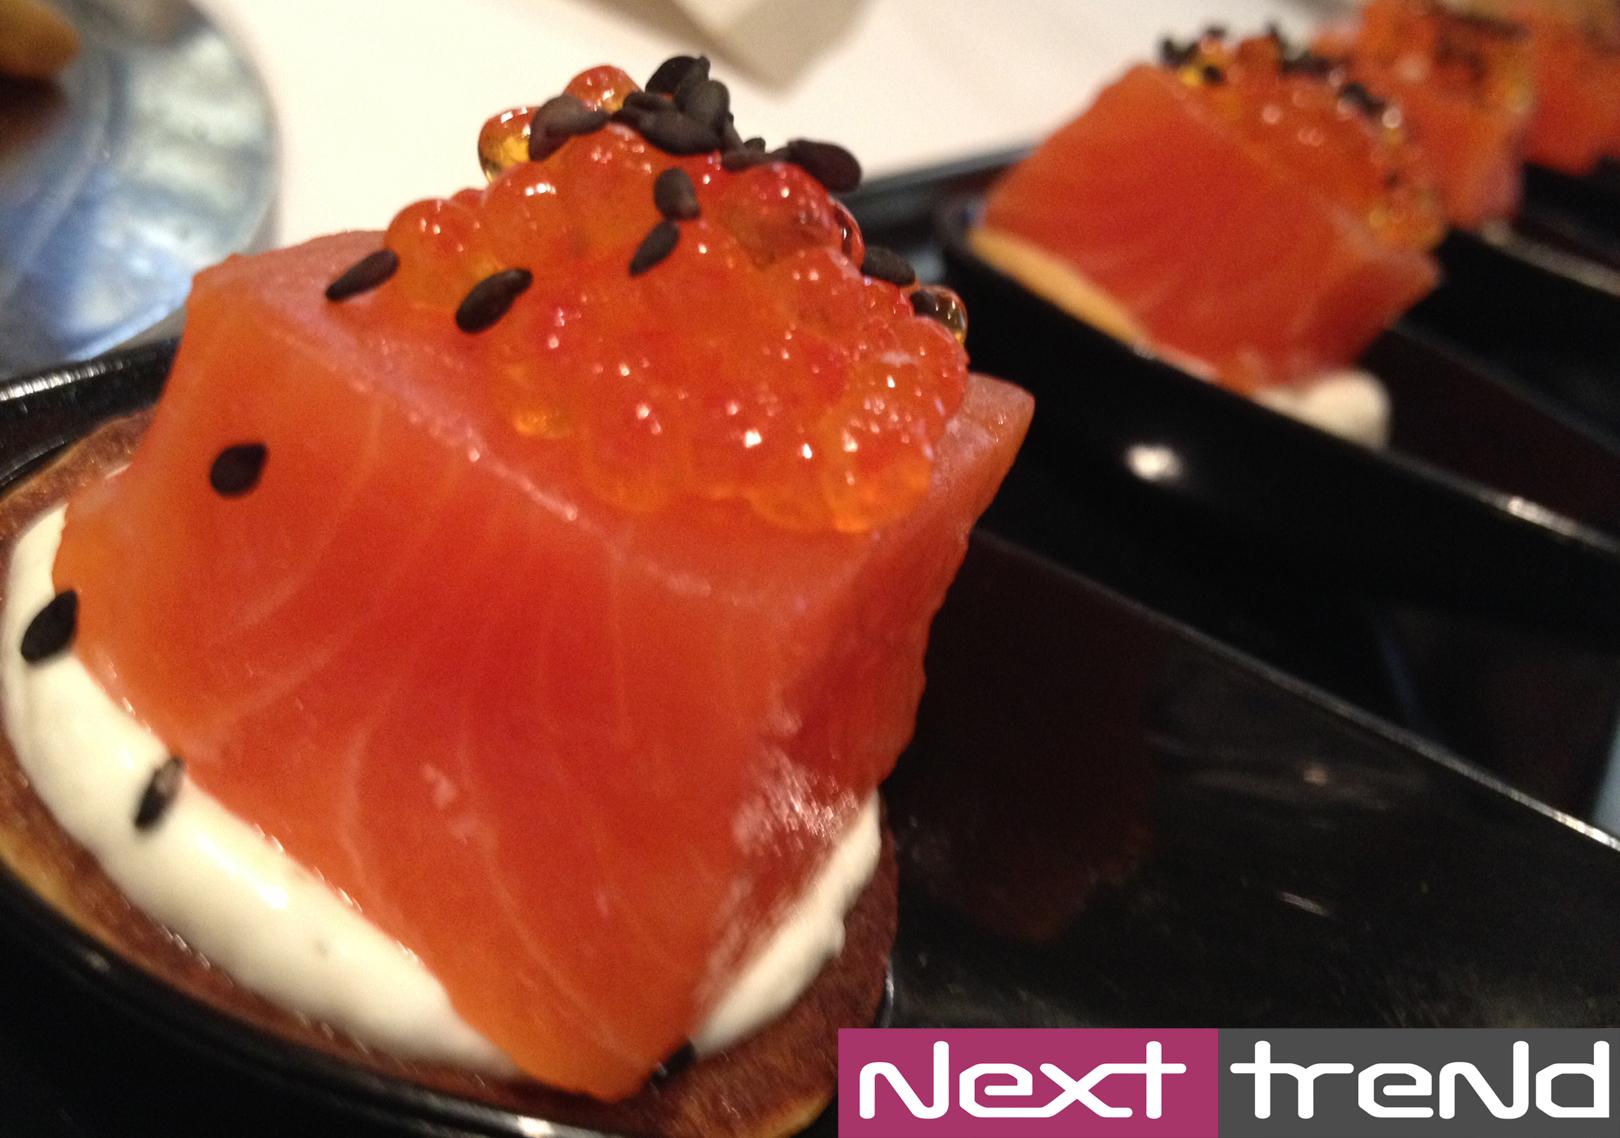 Gallery-hotel-menu-navidad-restaurante-nextic-nexttrend